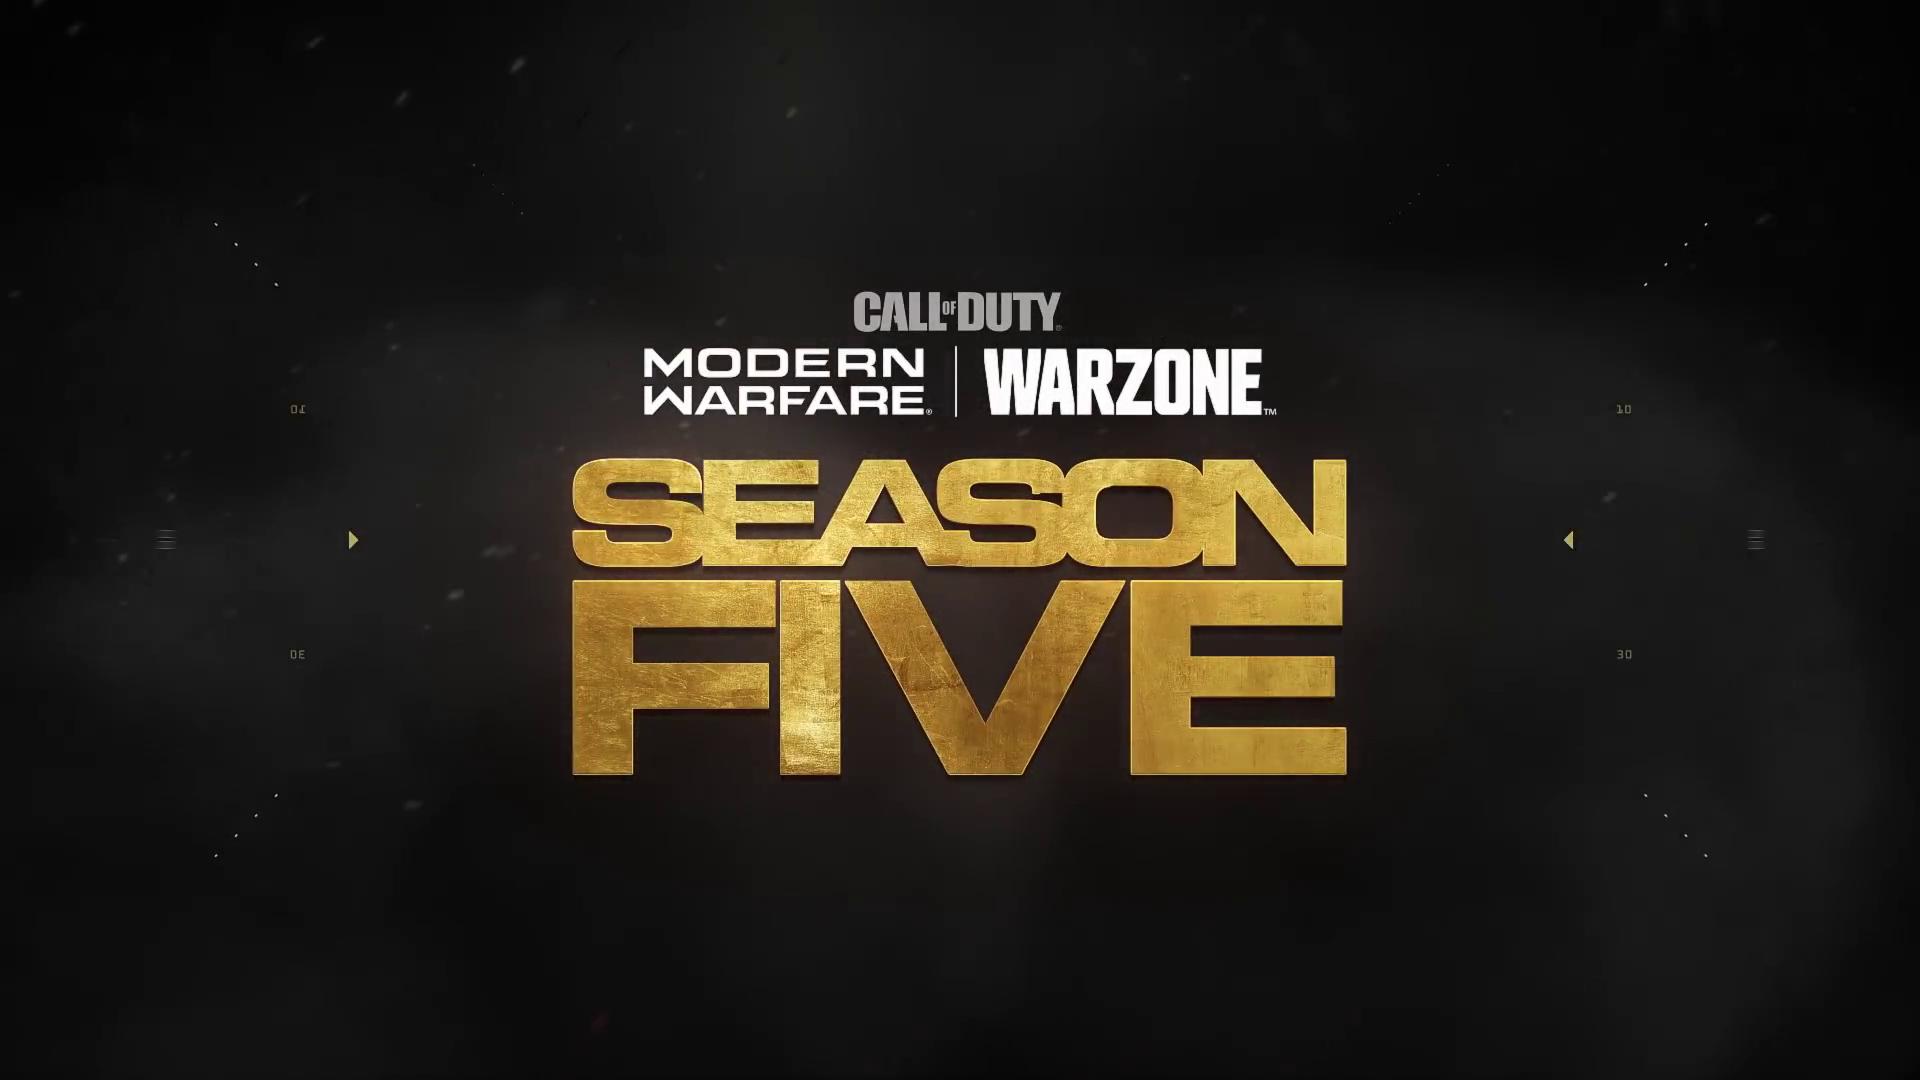 When Does Season 4 End And Season 5 Begin In Call Of Duty Modern